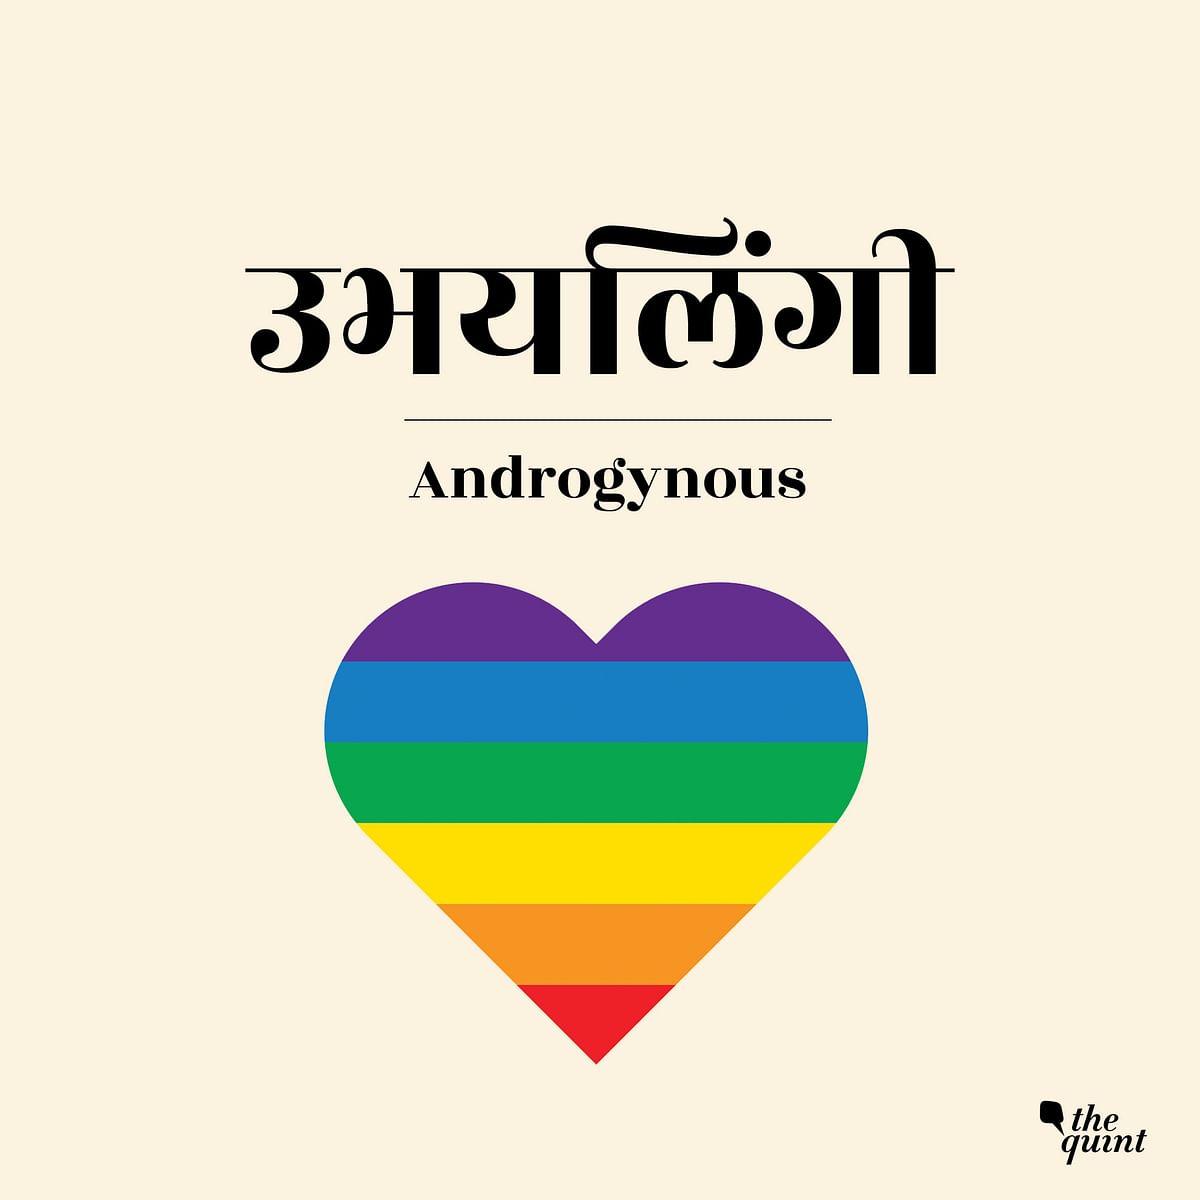 Abhyalingi is Androgynous